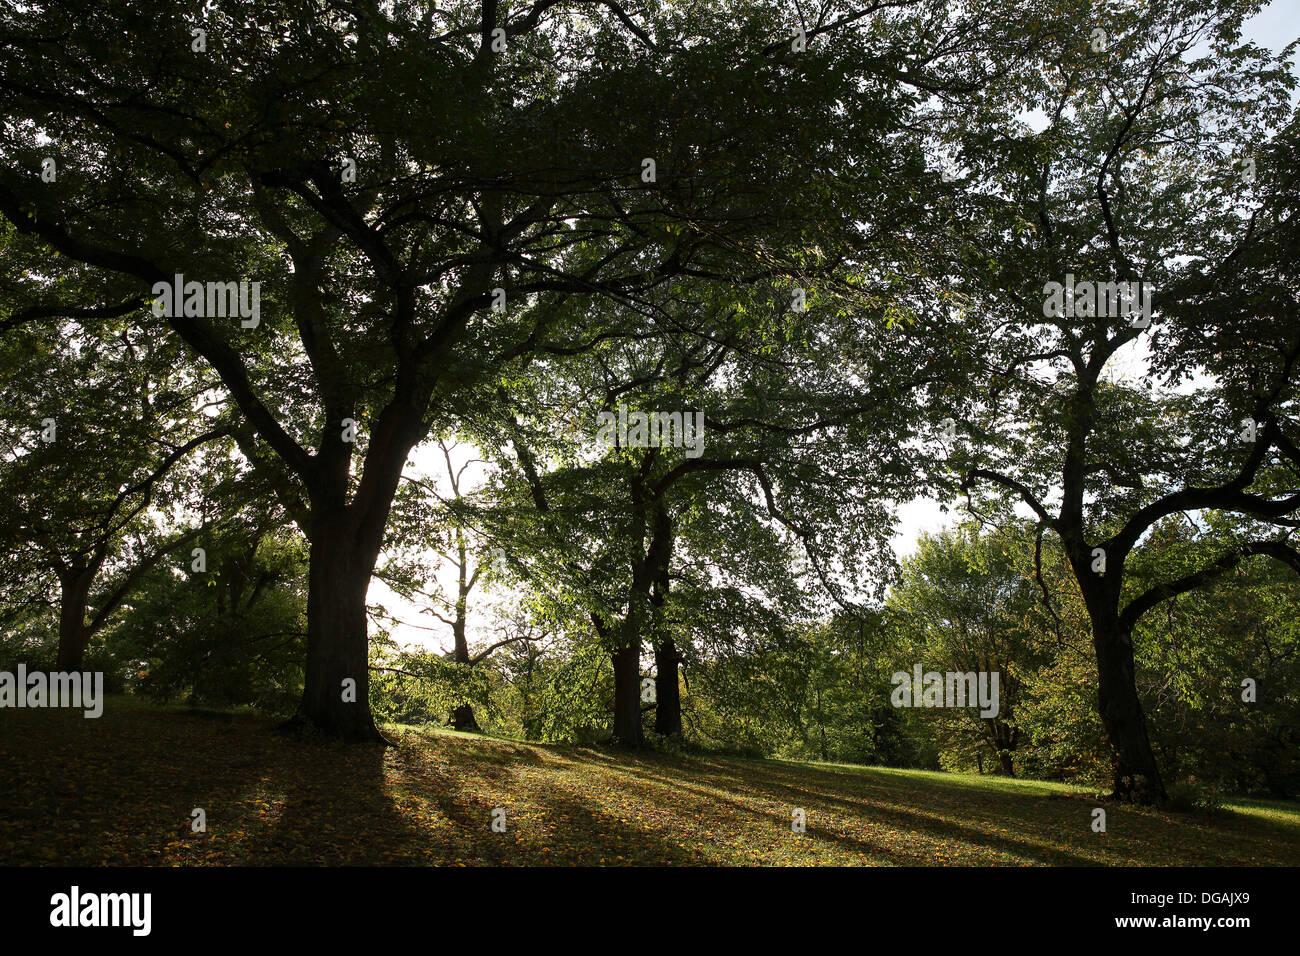 Arnold Arboretum, Boston, Massachusetts, USA - Stock Image